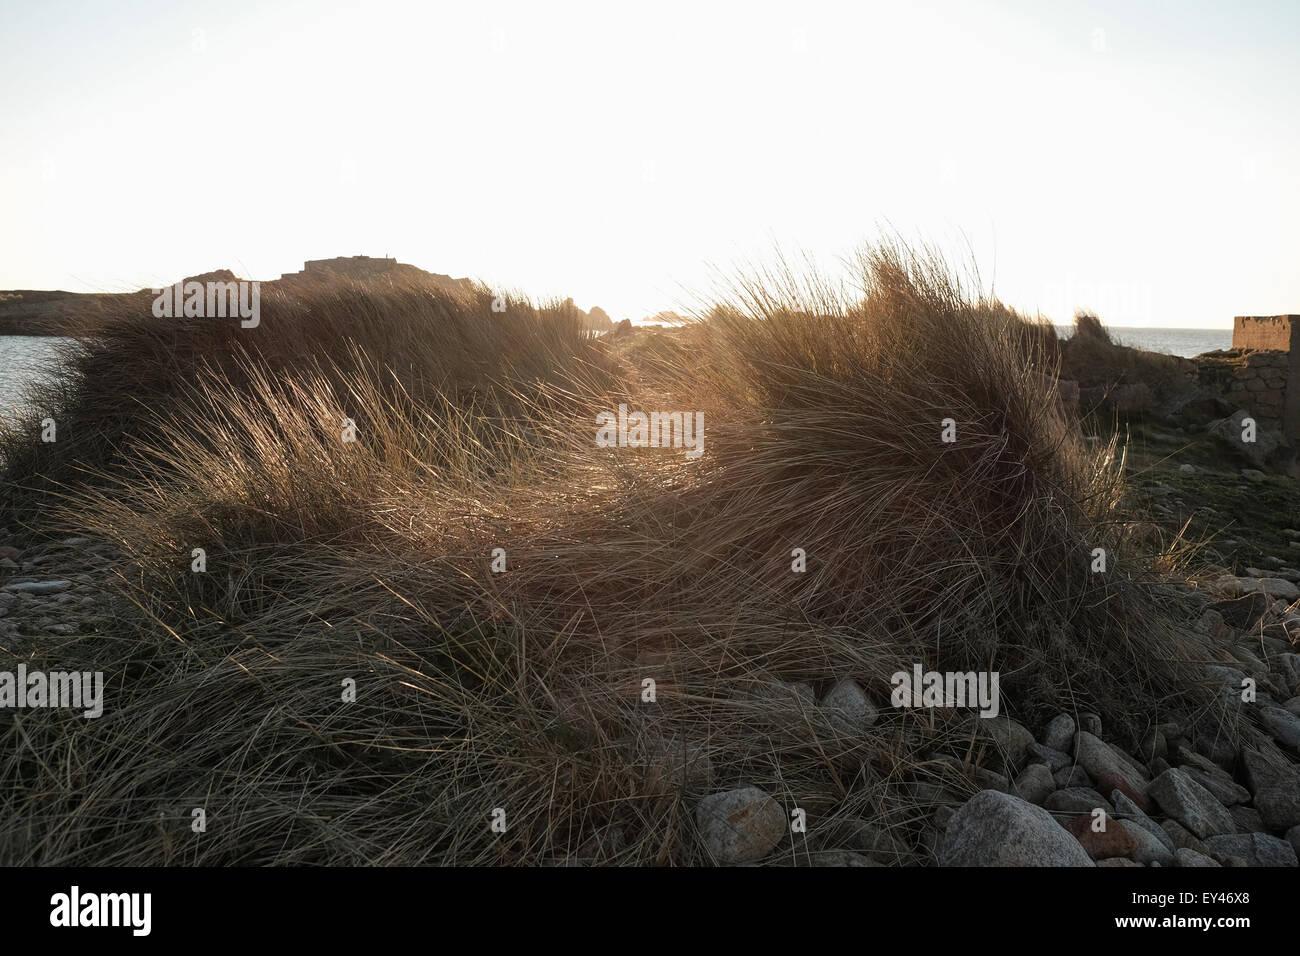 Vazon beach Guernsey before sunset - Stock Image